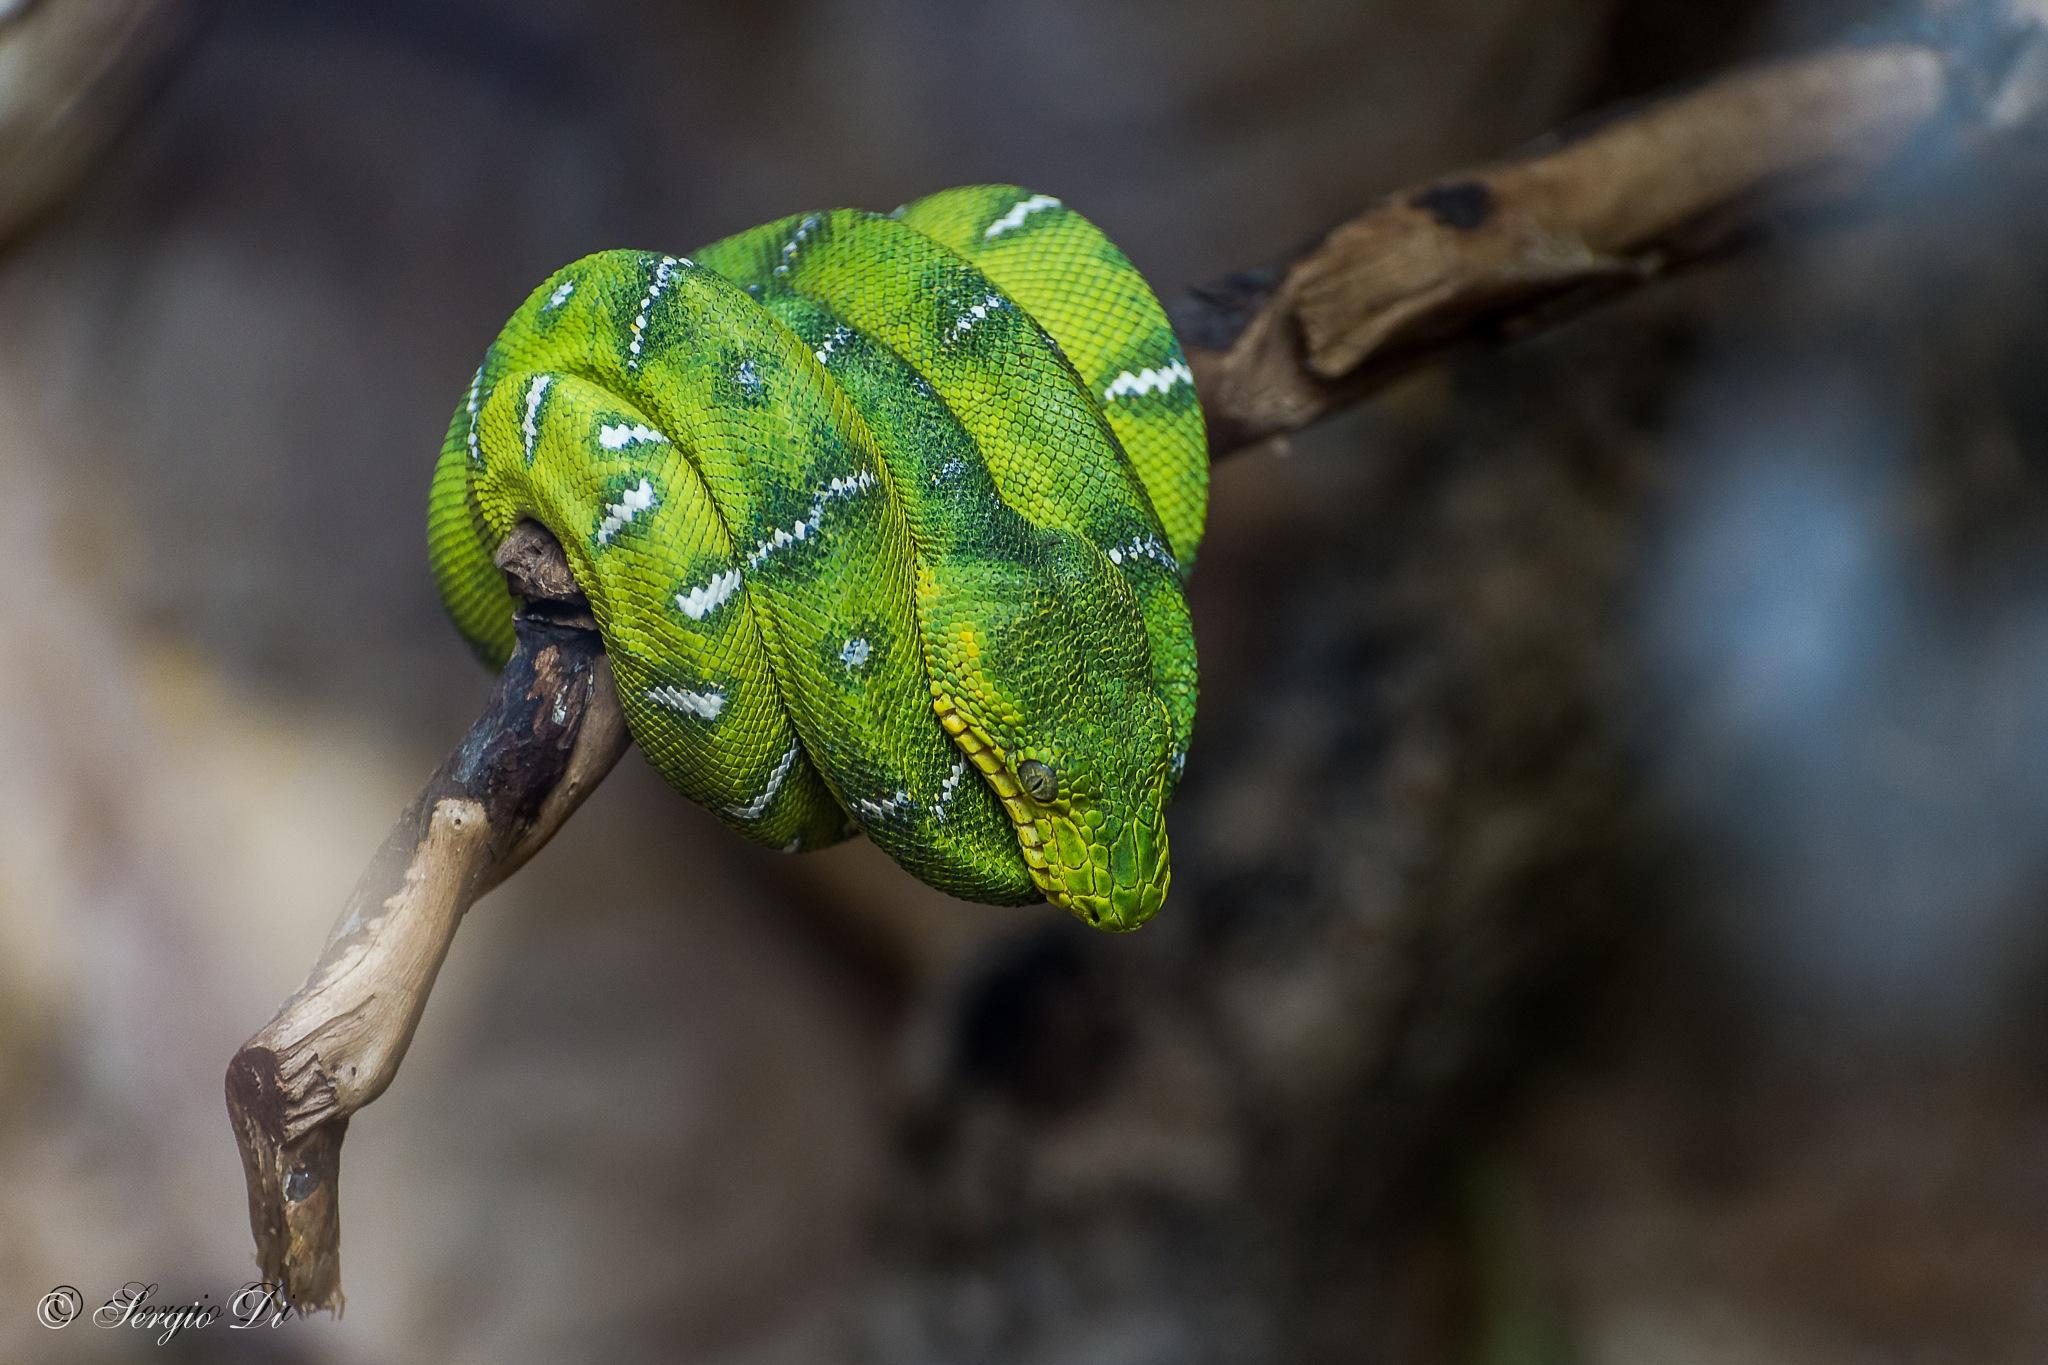 Diamantino verde by sergiodi